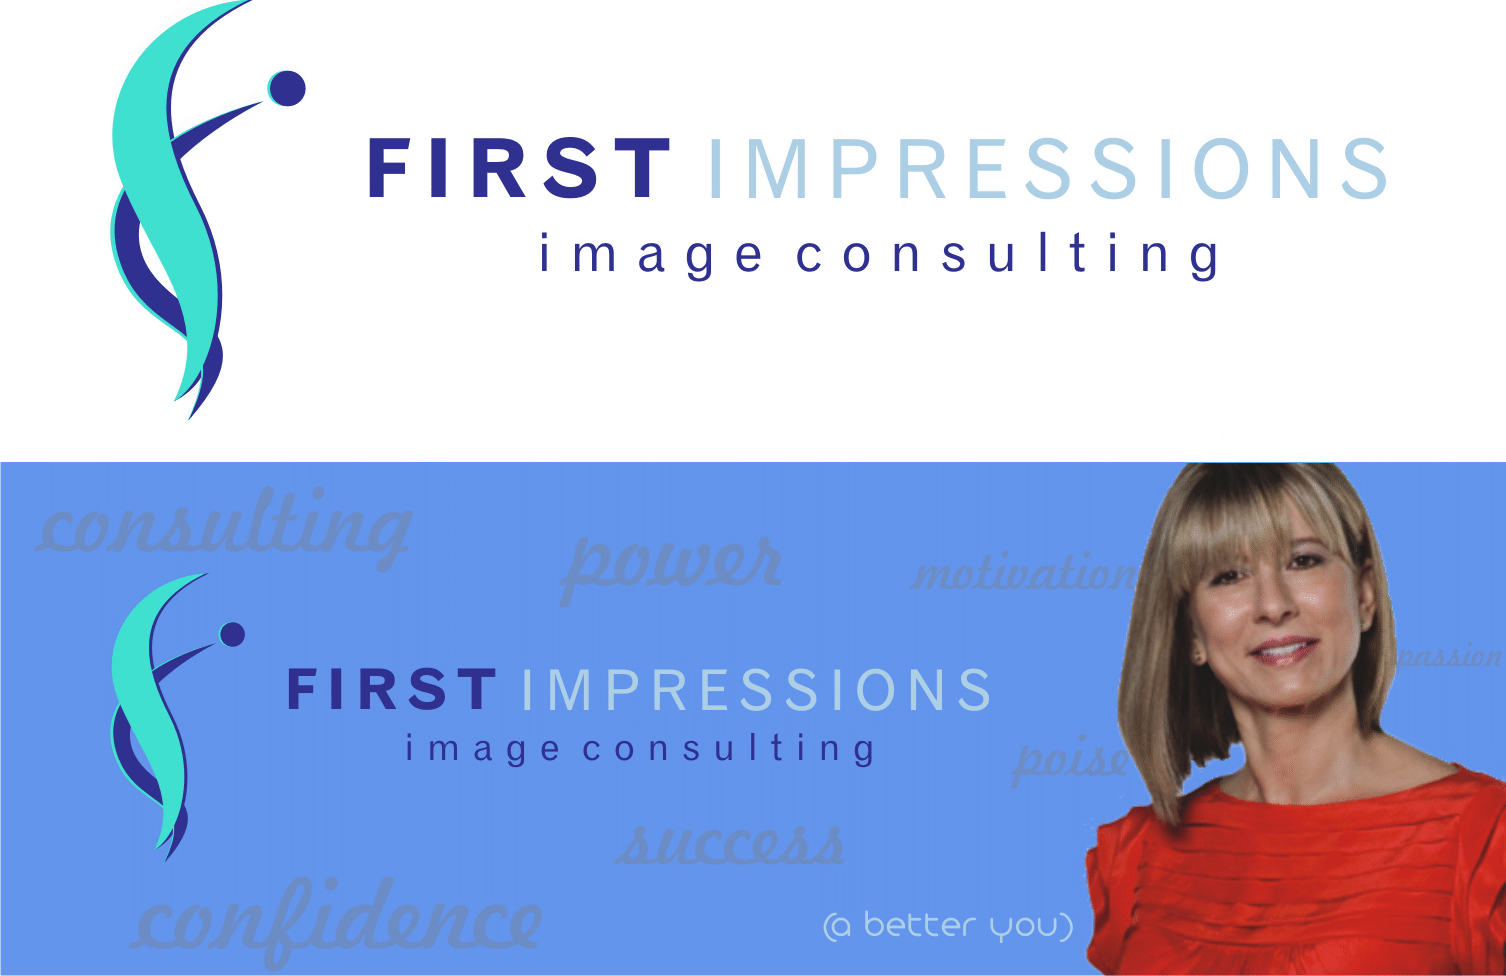 Logo Design by Artbeno Artbeno - Entry No. 139 in the Logo Design Contest First Impressions Image Consulting Logo Design.